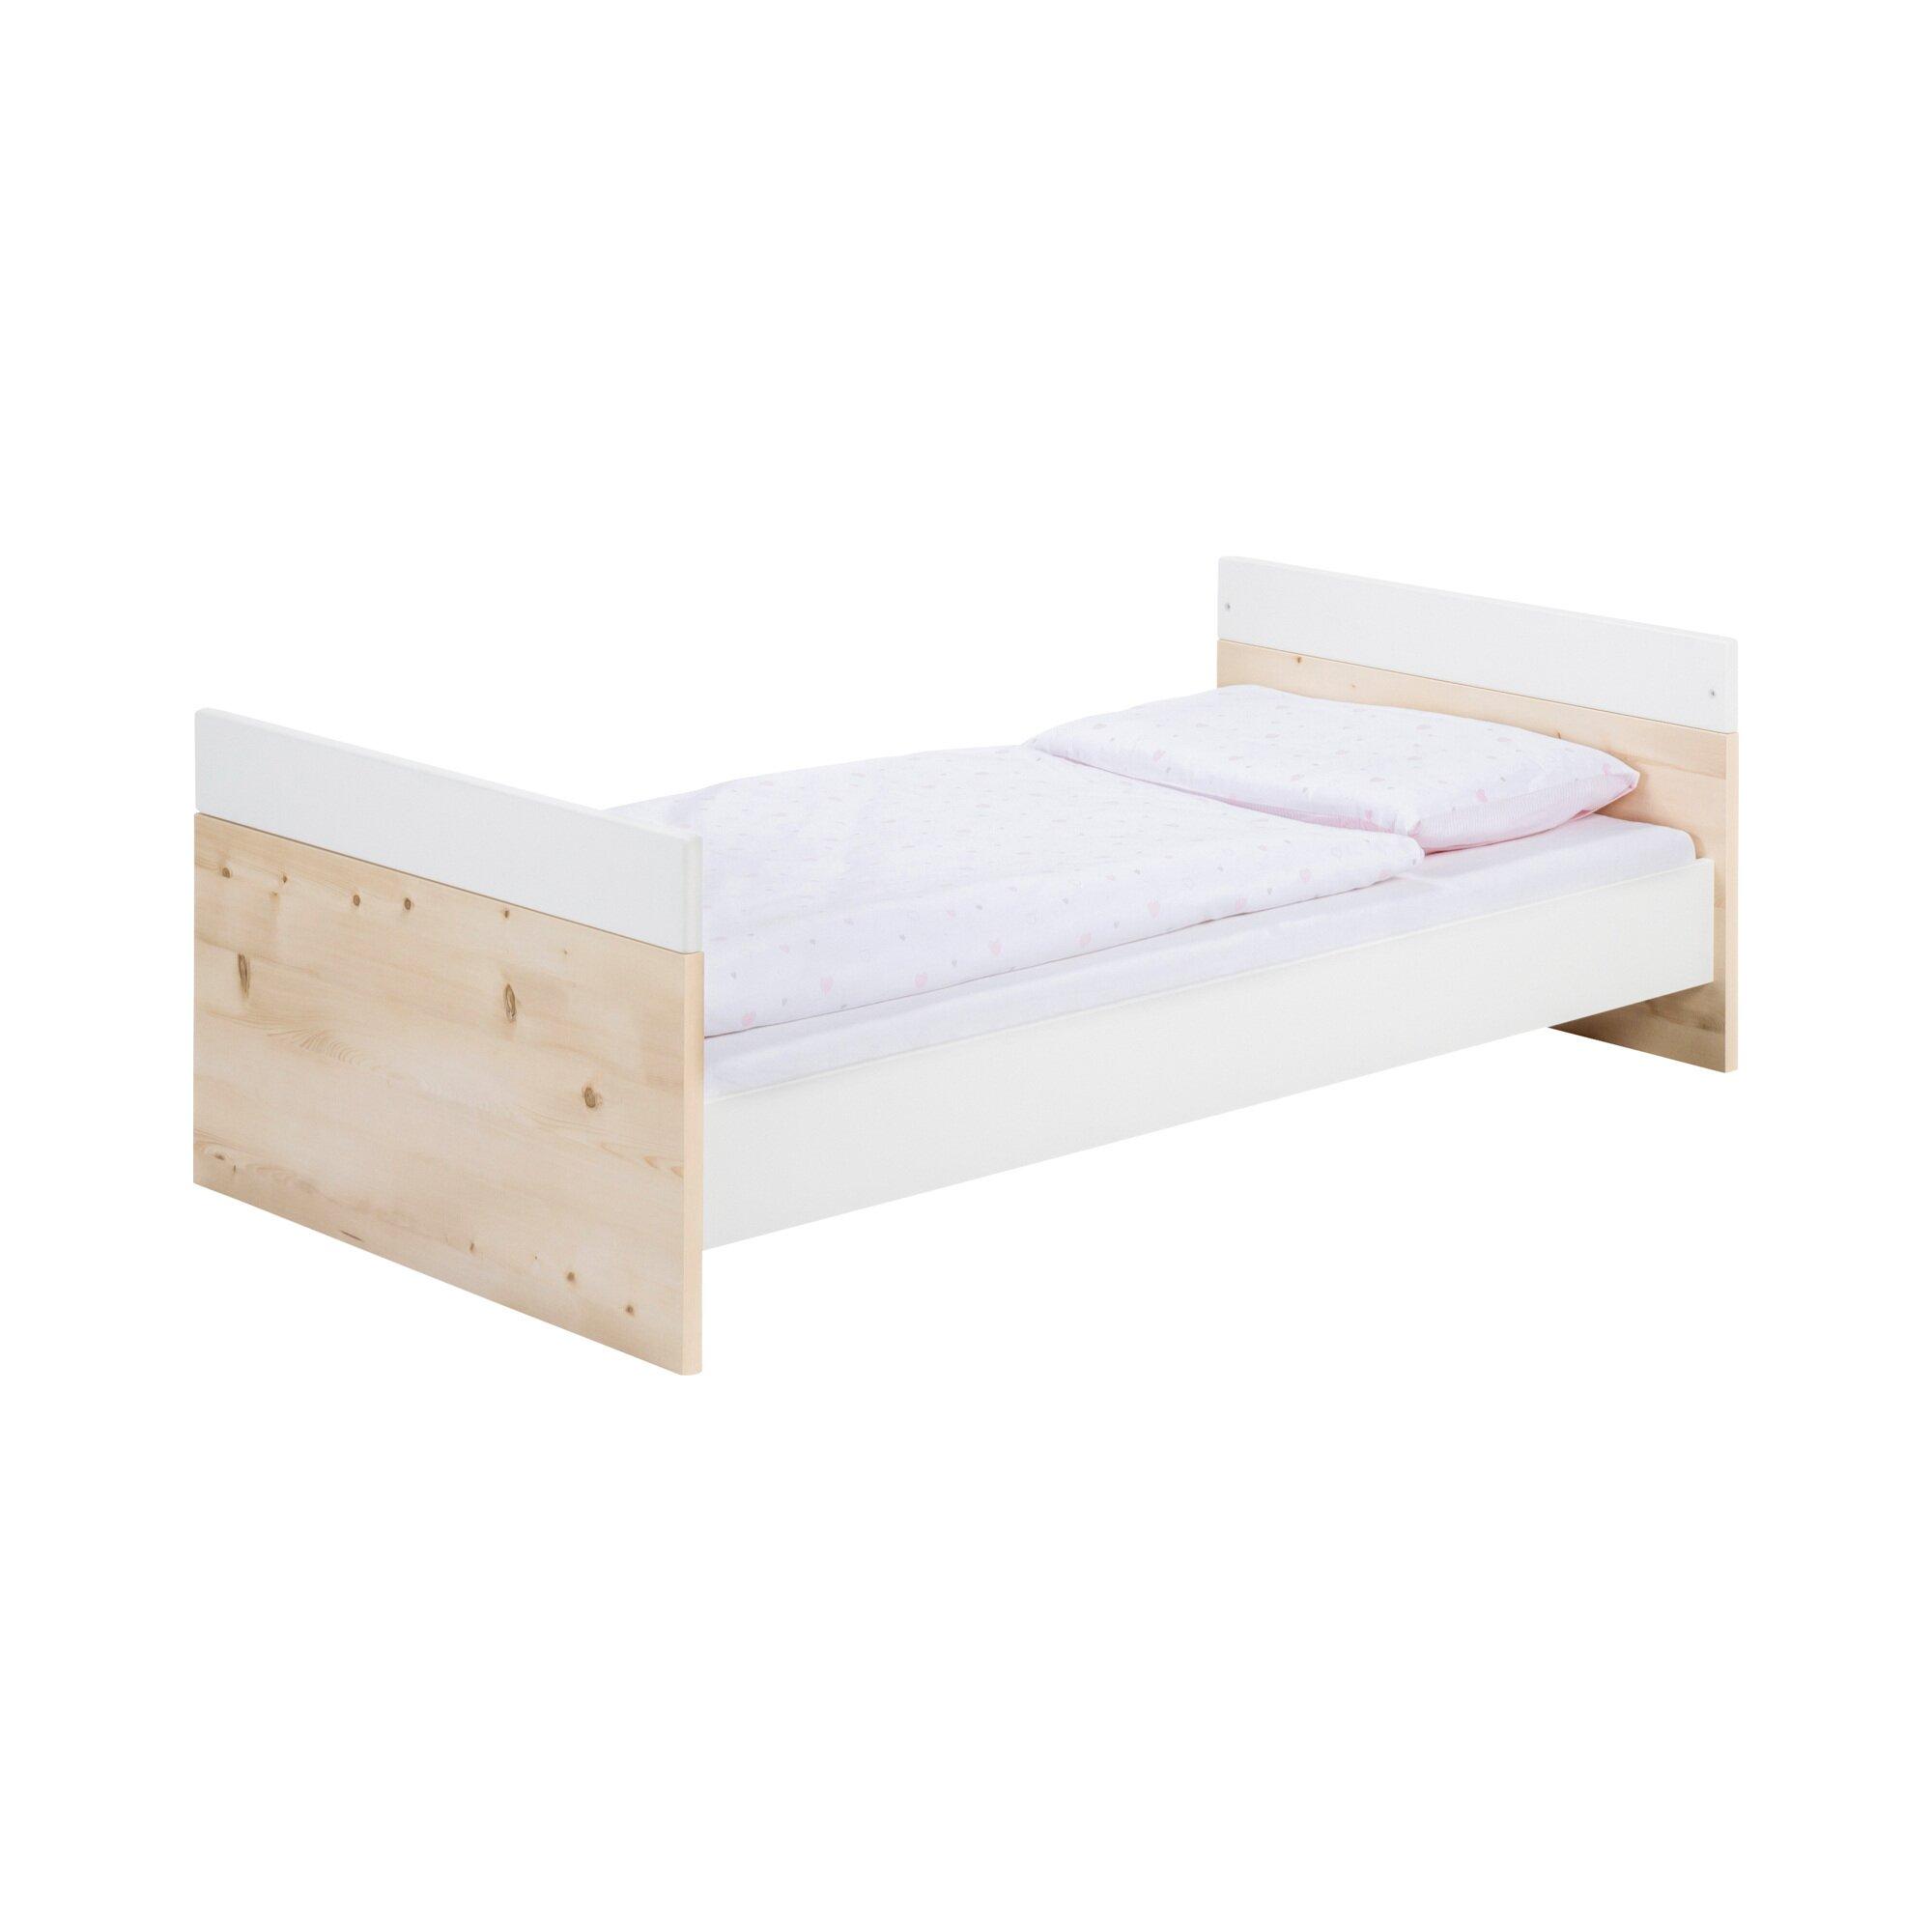 schardt-babybett-timber-pinie-70x140-cm